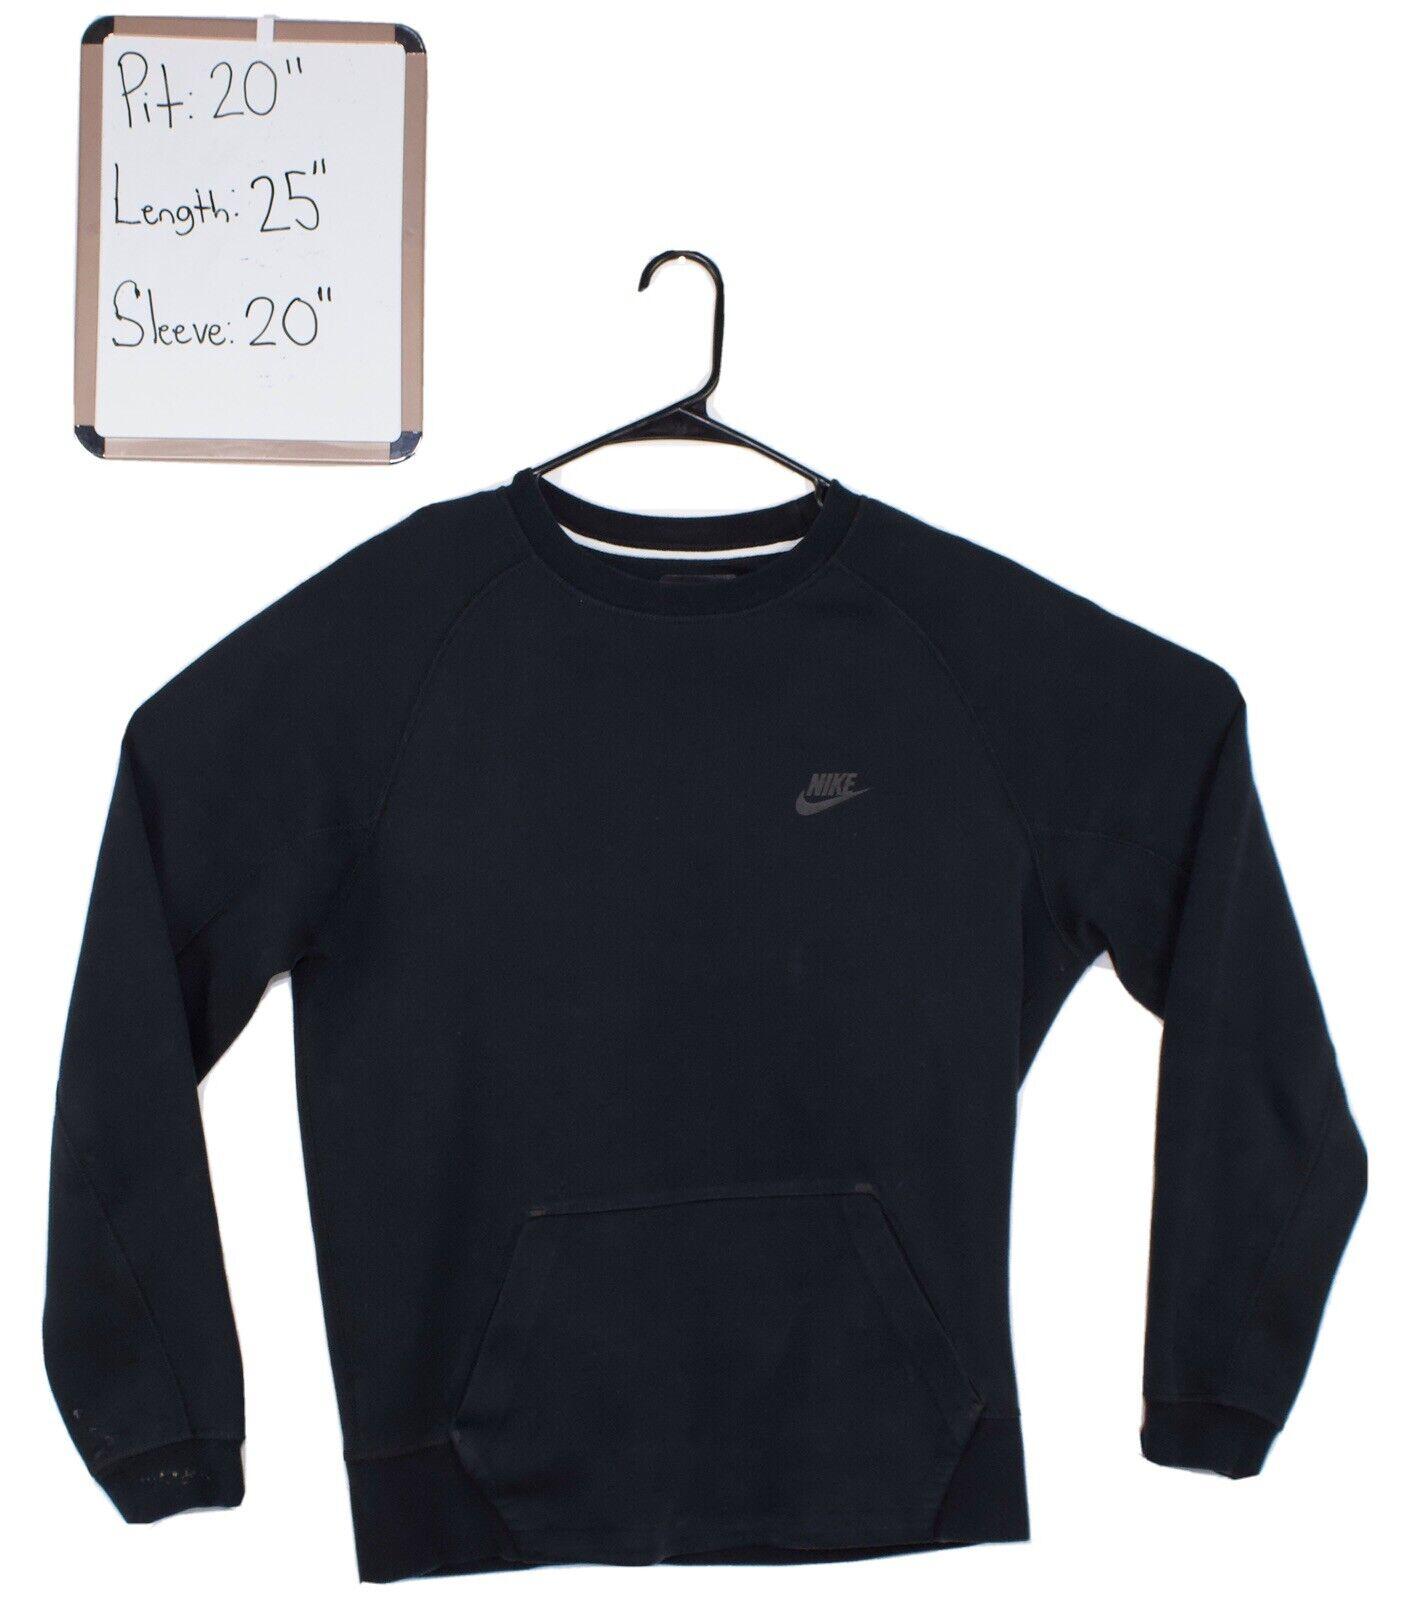 Nike Tech Fleece Crewneck Sweatshirt Men's Size Small Black Long Sleeve  Pockets